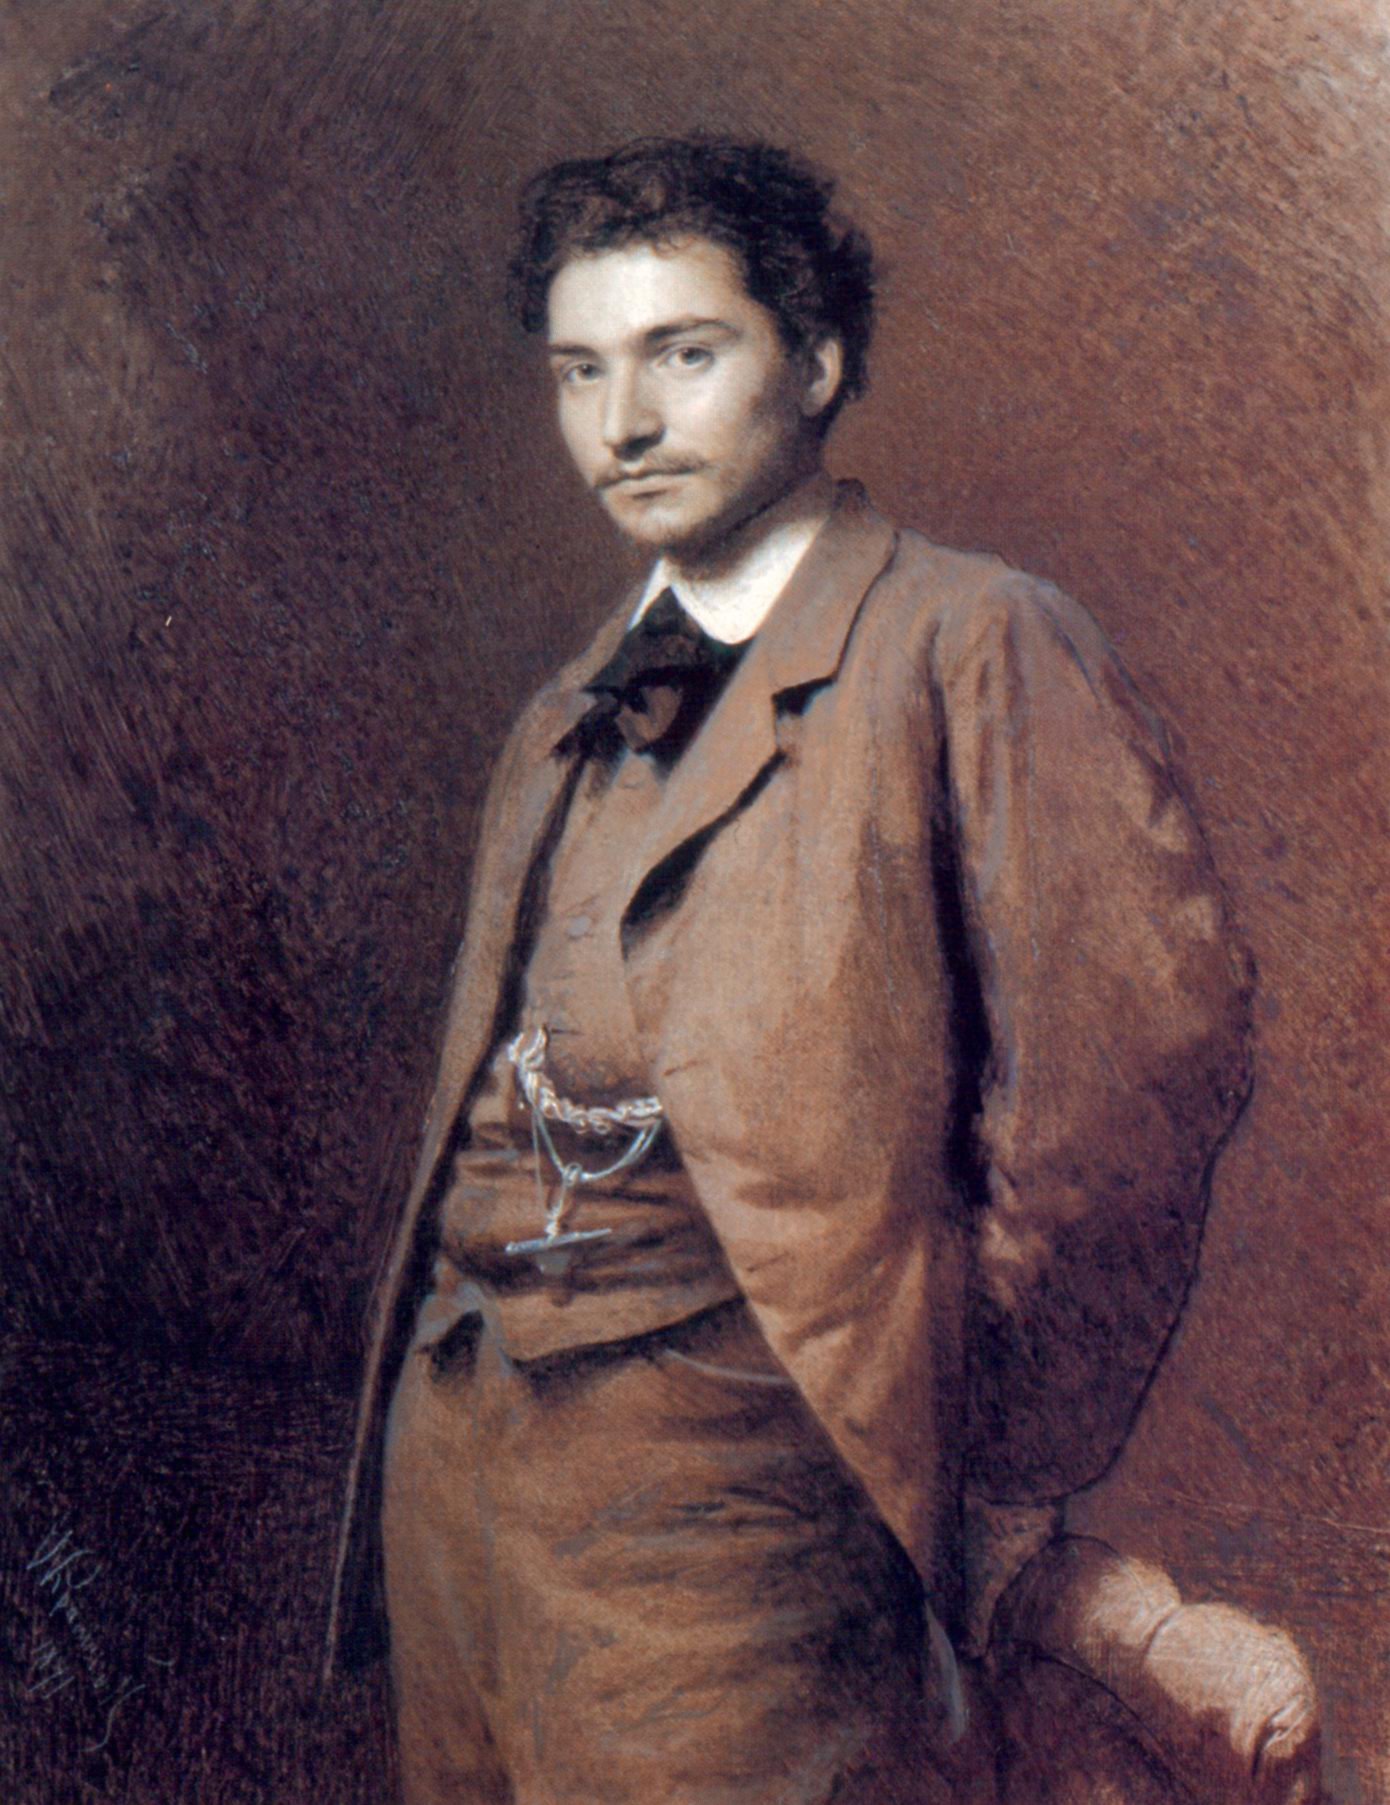 Портрет художника Федора Александровича Васильева, Крамской Иван Николаевич